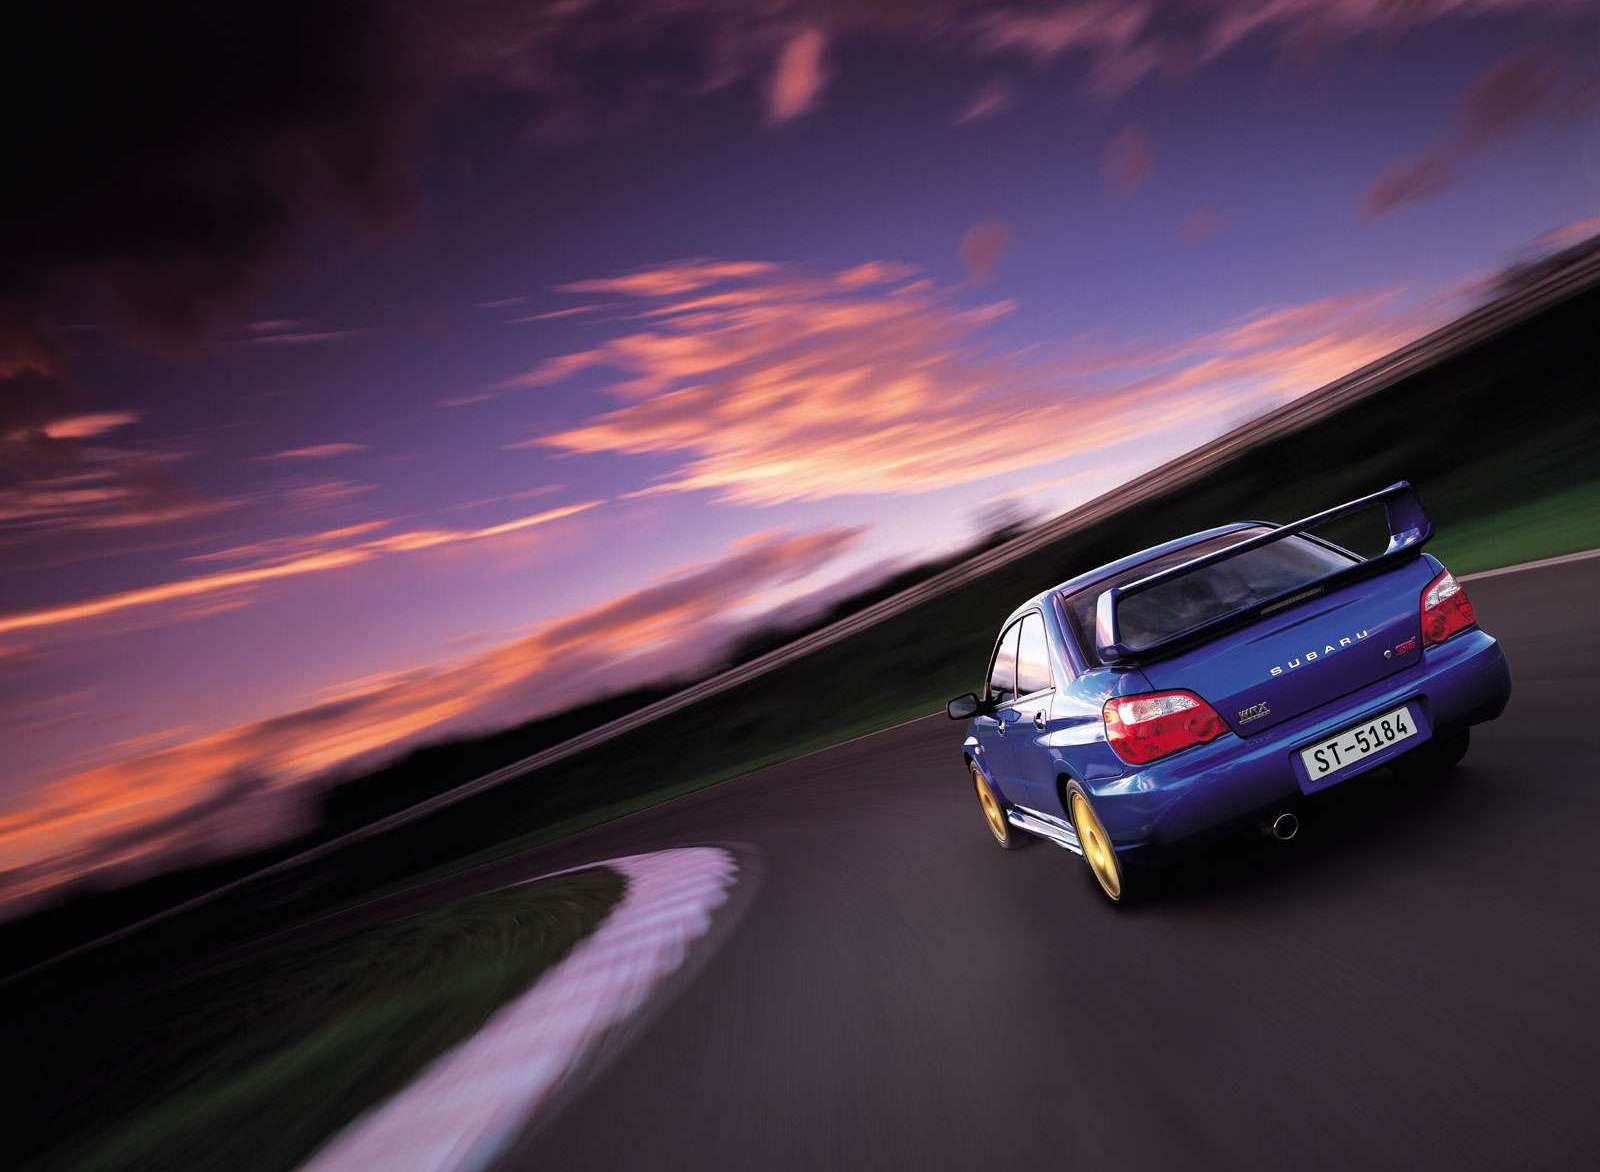 "Subaru%2BImpreza%2BWRX 15 ""φθηνά"" μεταχειρισμένα που στρίβουν σαν τρένα Audi S3, BMW M3 E46, Ford Focus RS, Lancia Delta Integralle, Lotus Elise, Mazda RX8, Mitsubishi Evo, Nissan Sunny GTI-R, Peugeot 106 Rallye, Porsche Boxster, Subaru Impreza WRX, zblog, αυτοκίνητα"